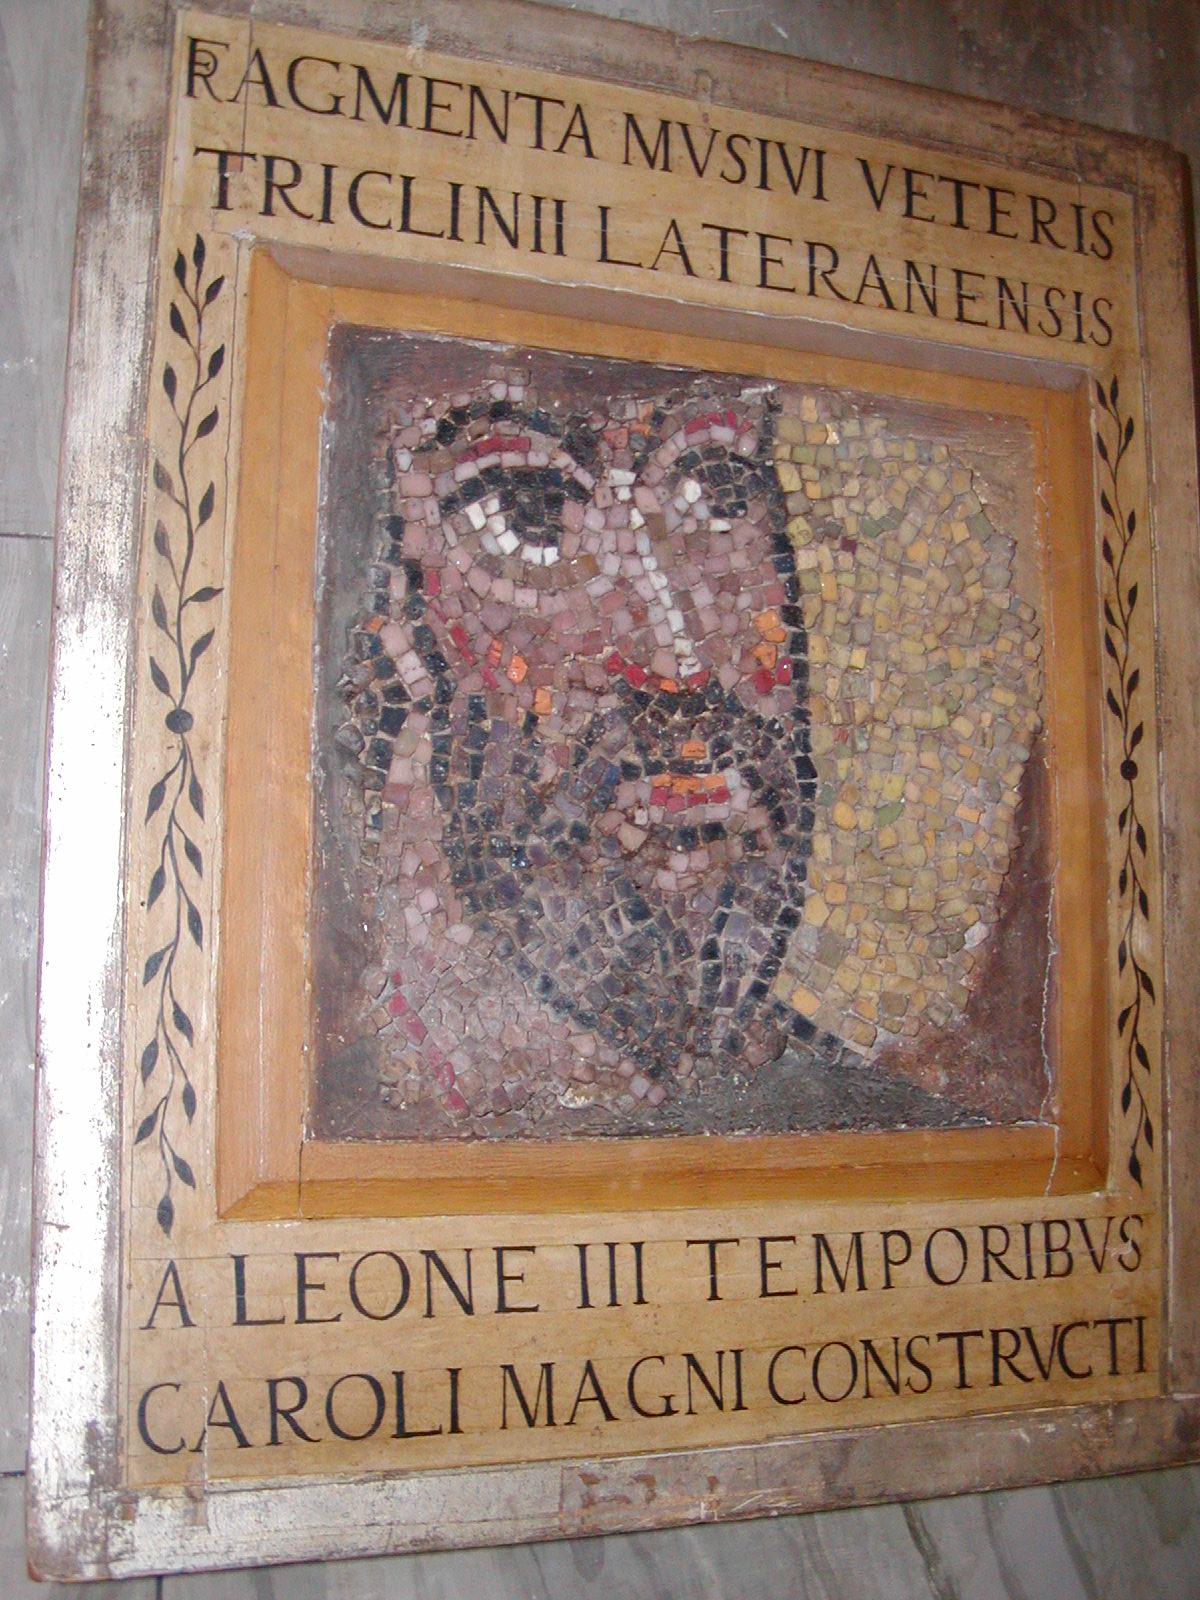 Vatican Library - 2002-09-10-153441